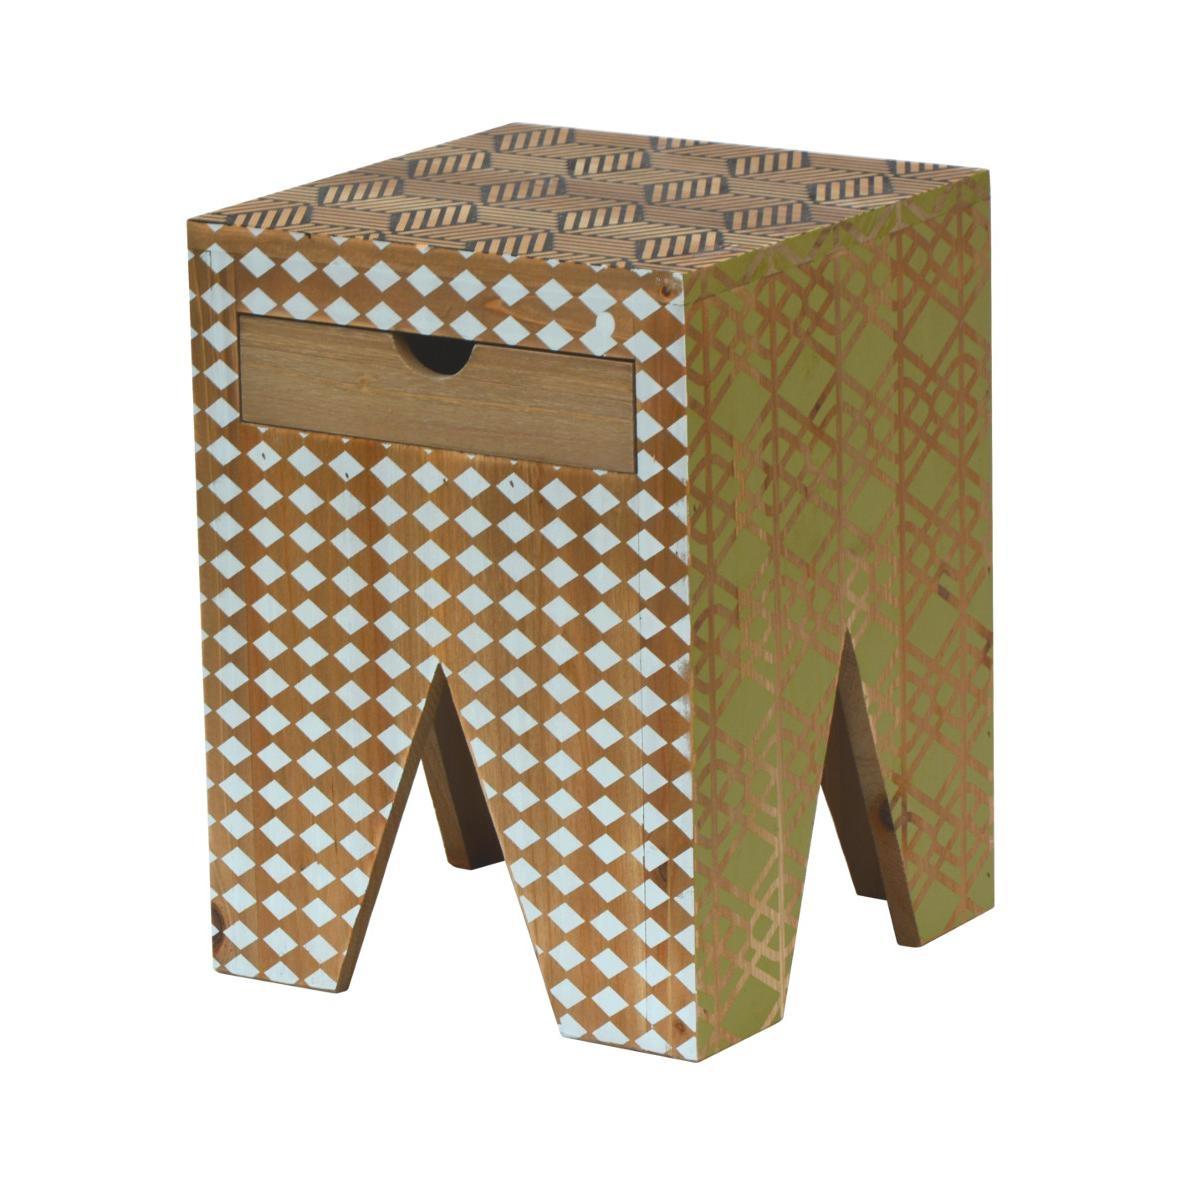 Taburet din lemn de brad cu 1 sertar Portofino F037 Multicolour, l30xA30xH40 cm imagine